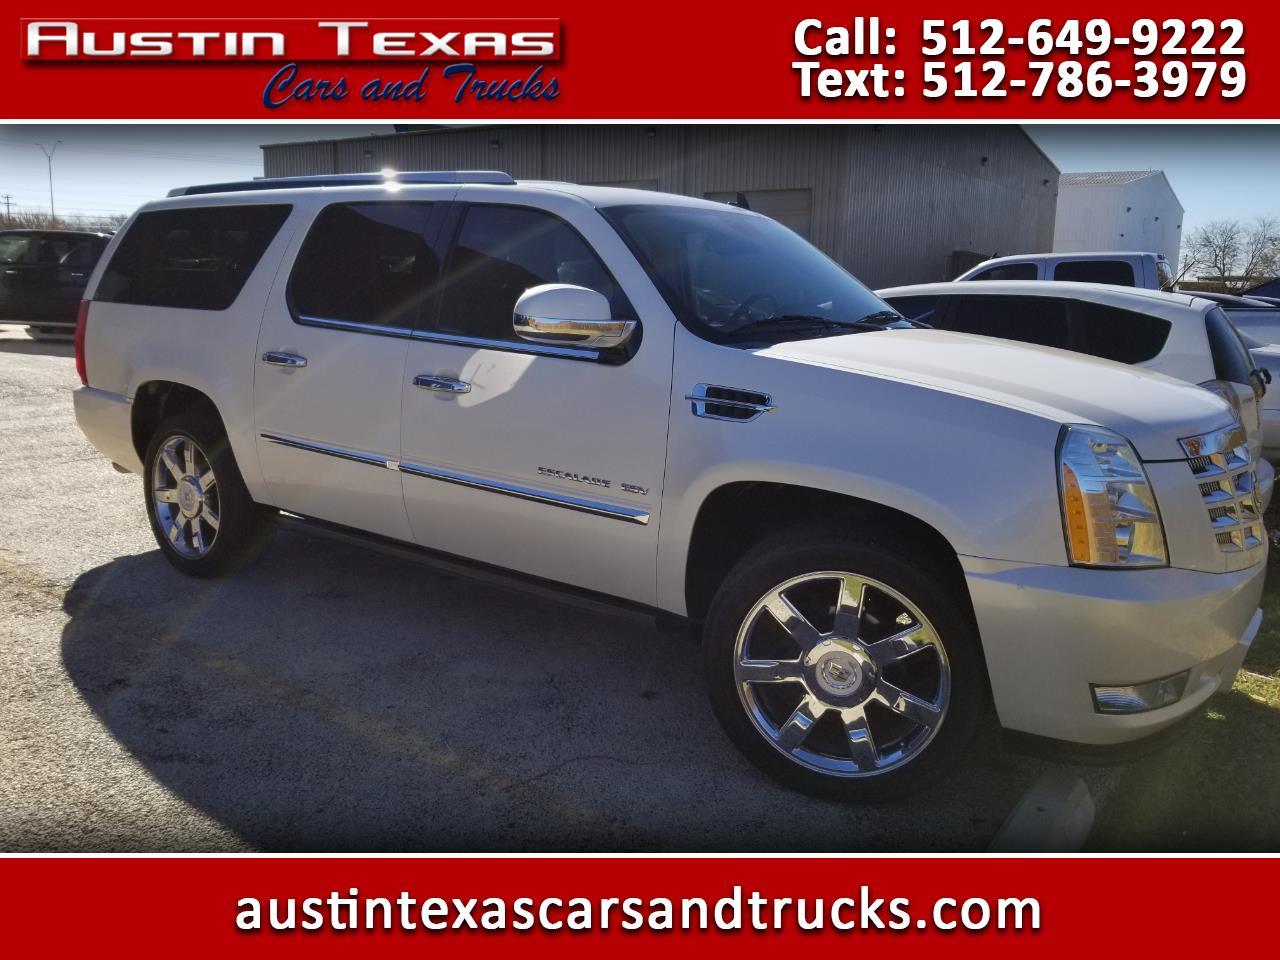 2011 Cadillac Escalade ESV 2WD 4dr Premium